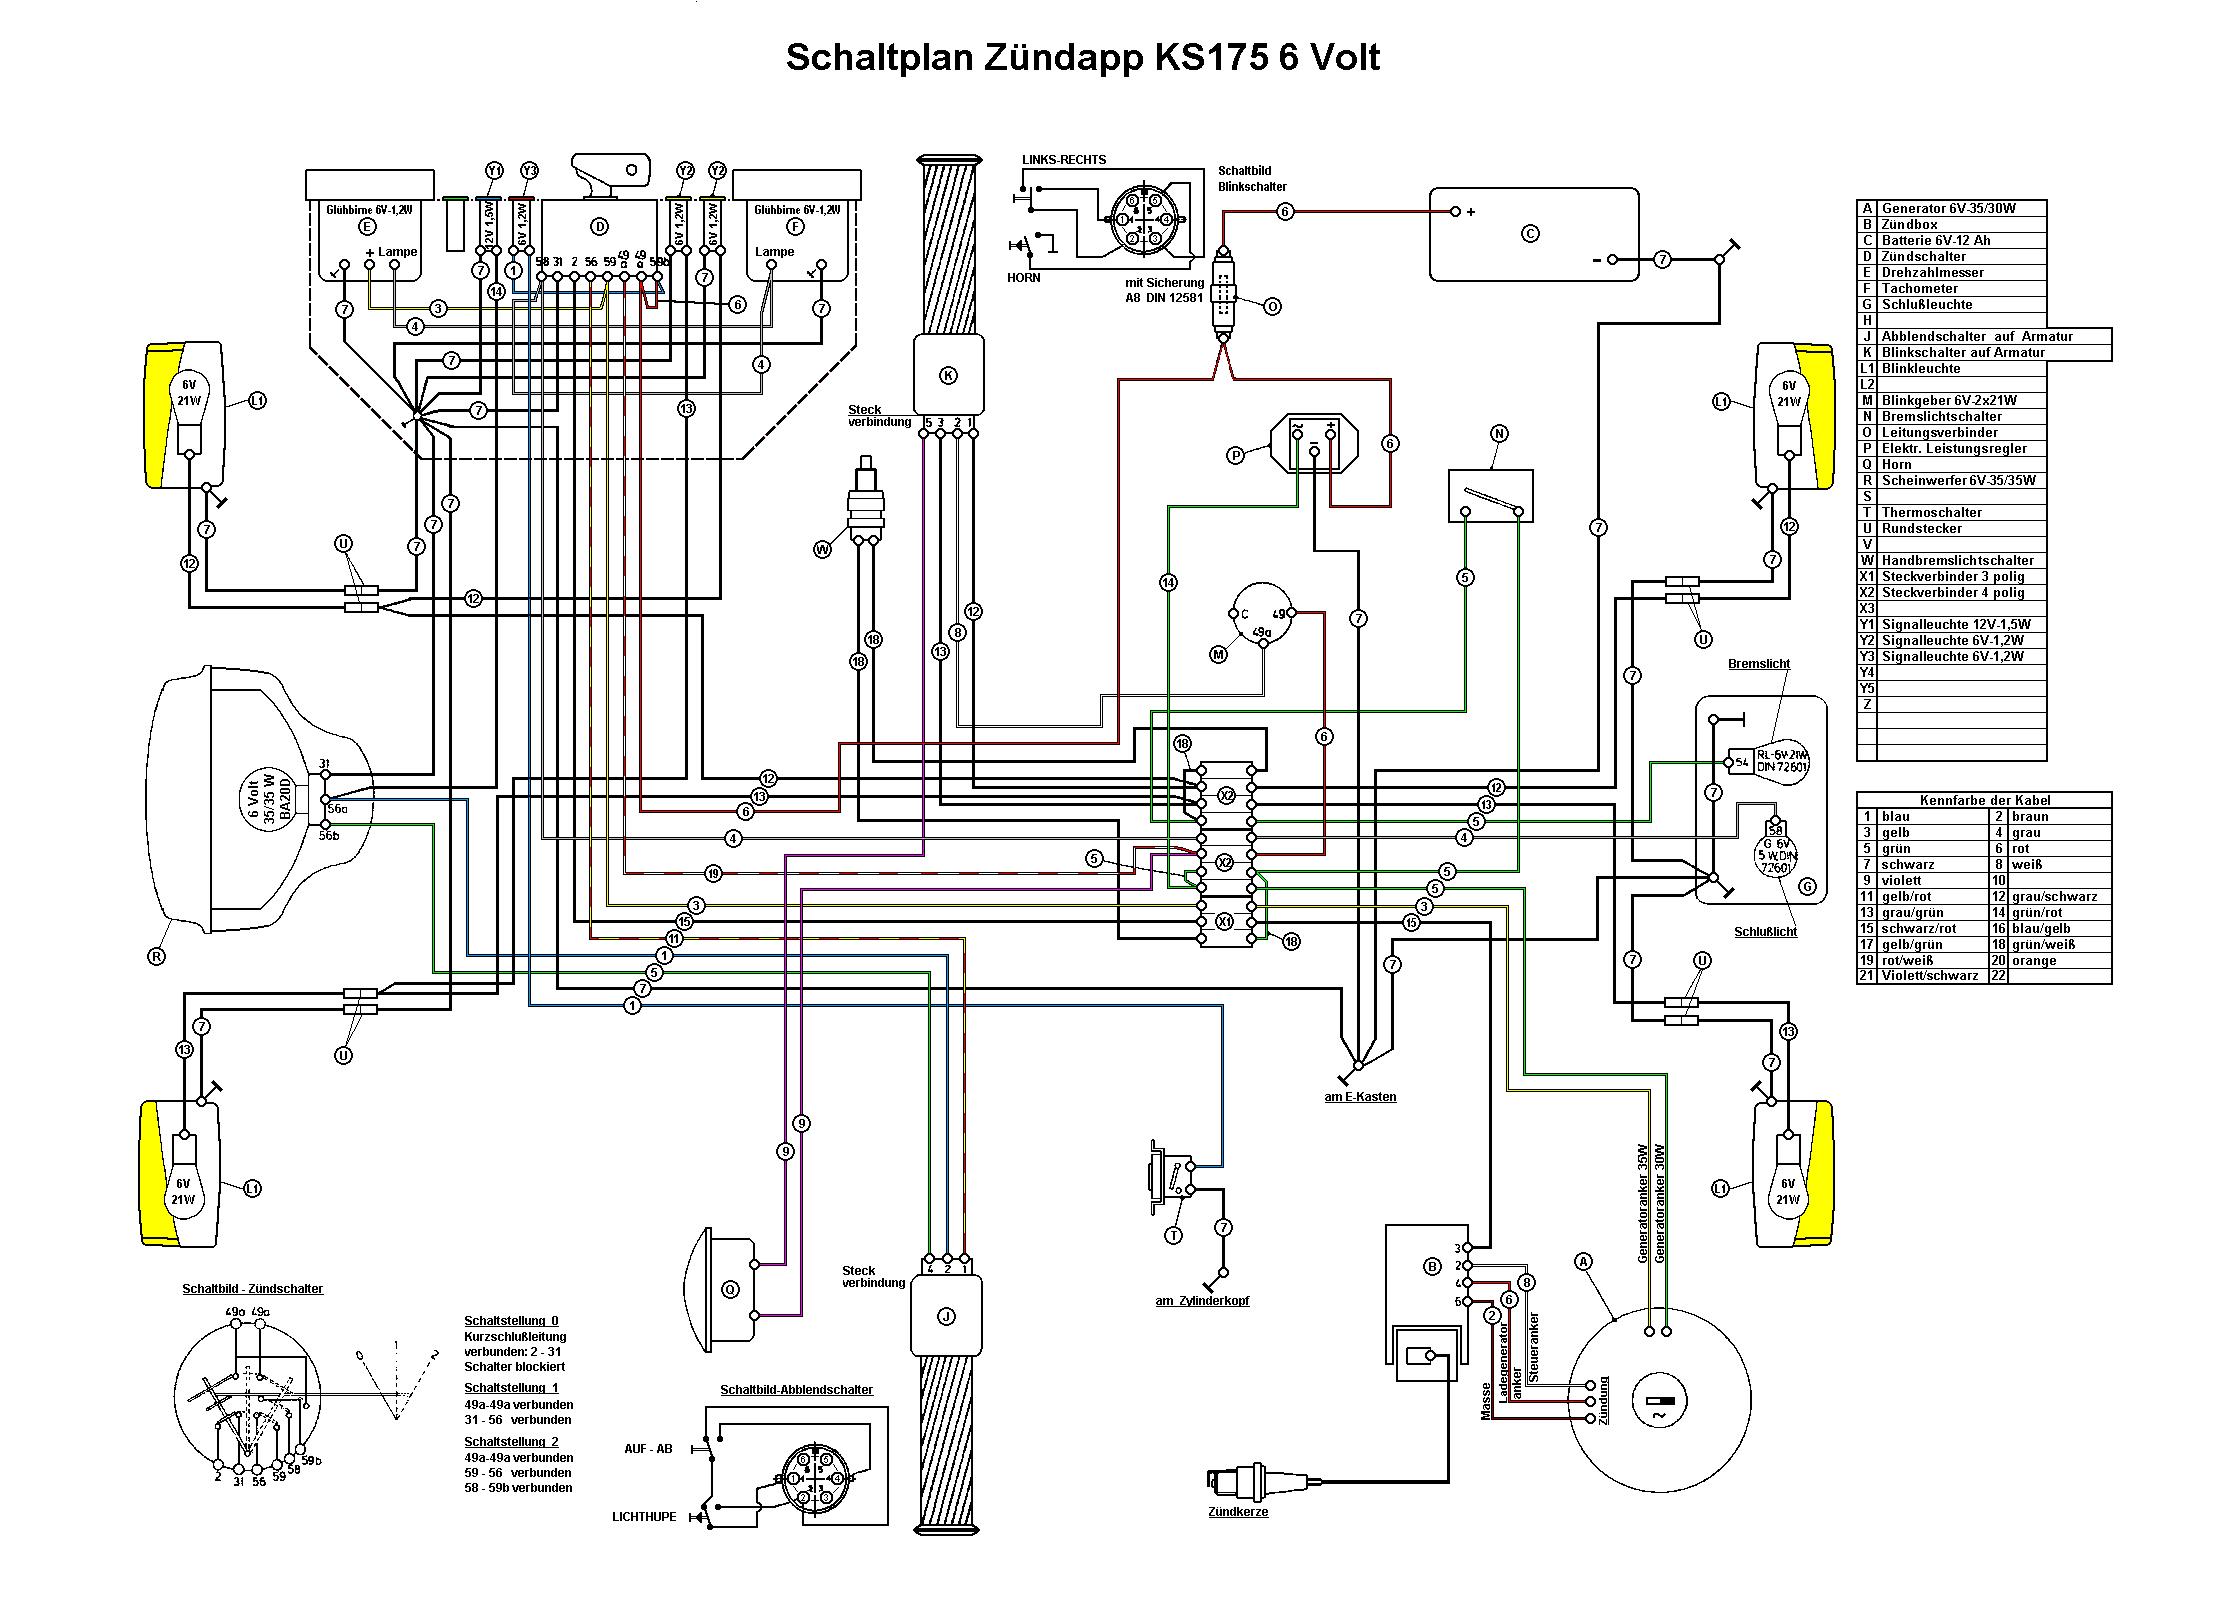 DIAGRAM] Honda Mtx 80 Wiring Diagram - 2004 Jeep Wrangler Tj Wiring Diagram  List harbor.mon1erinstrument.frmon1erinstrument.fr